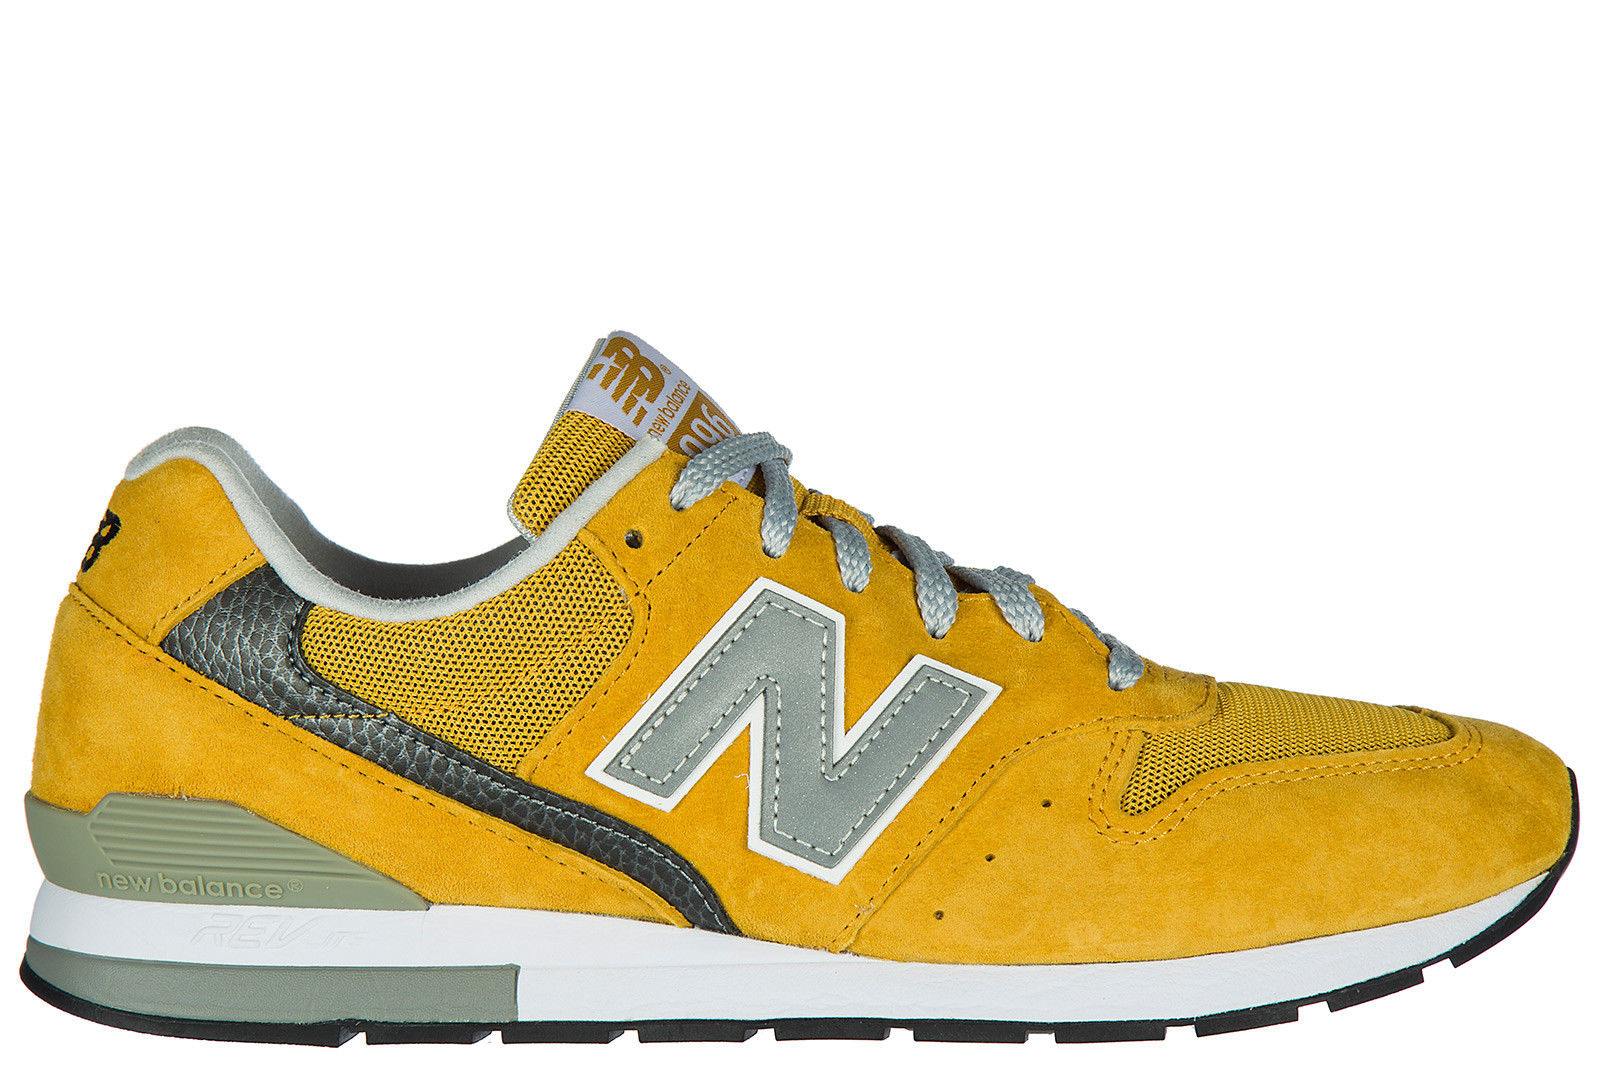 sneakers uomo new balance 2018